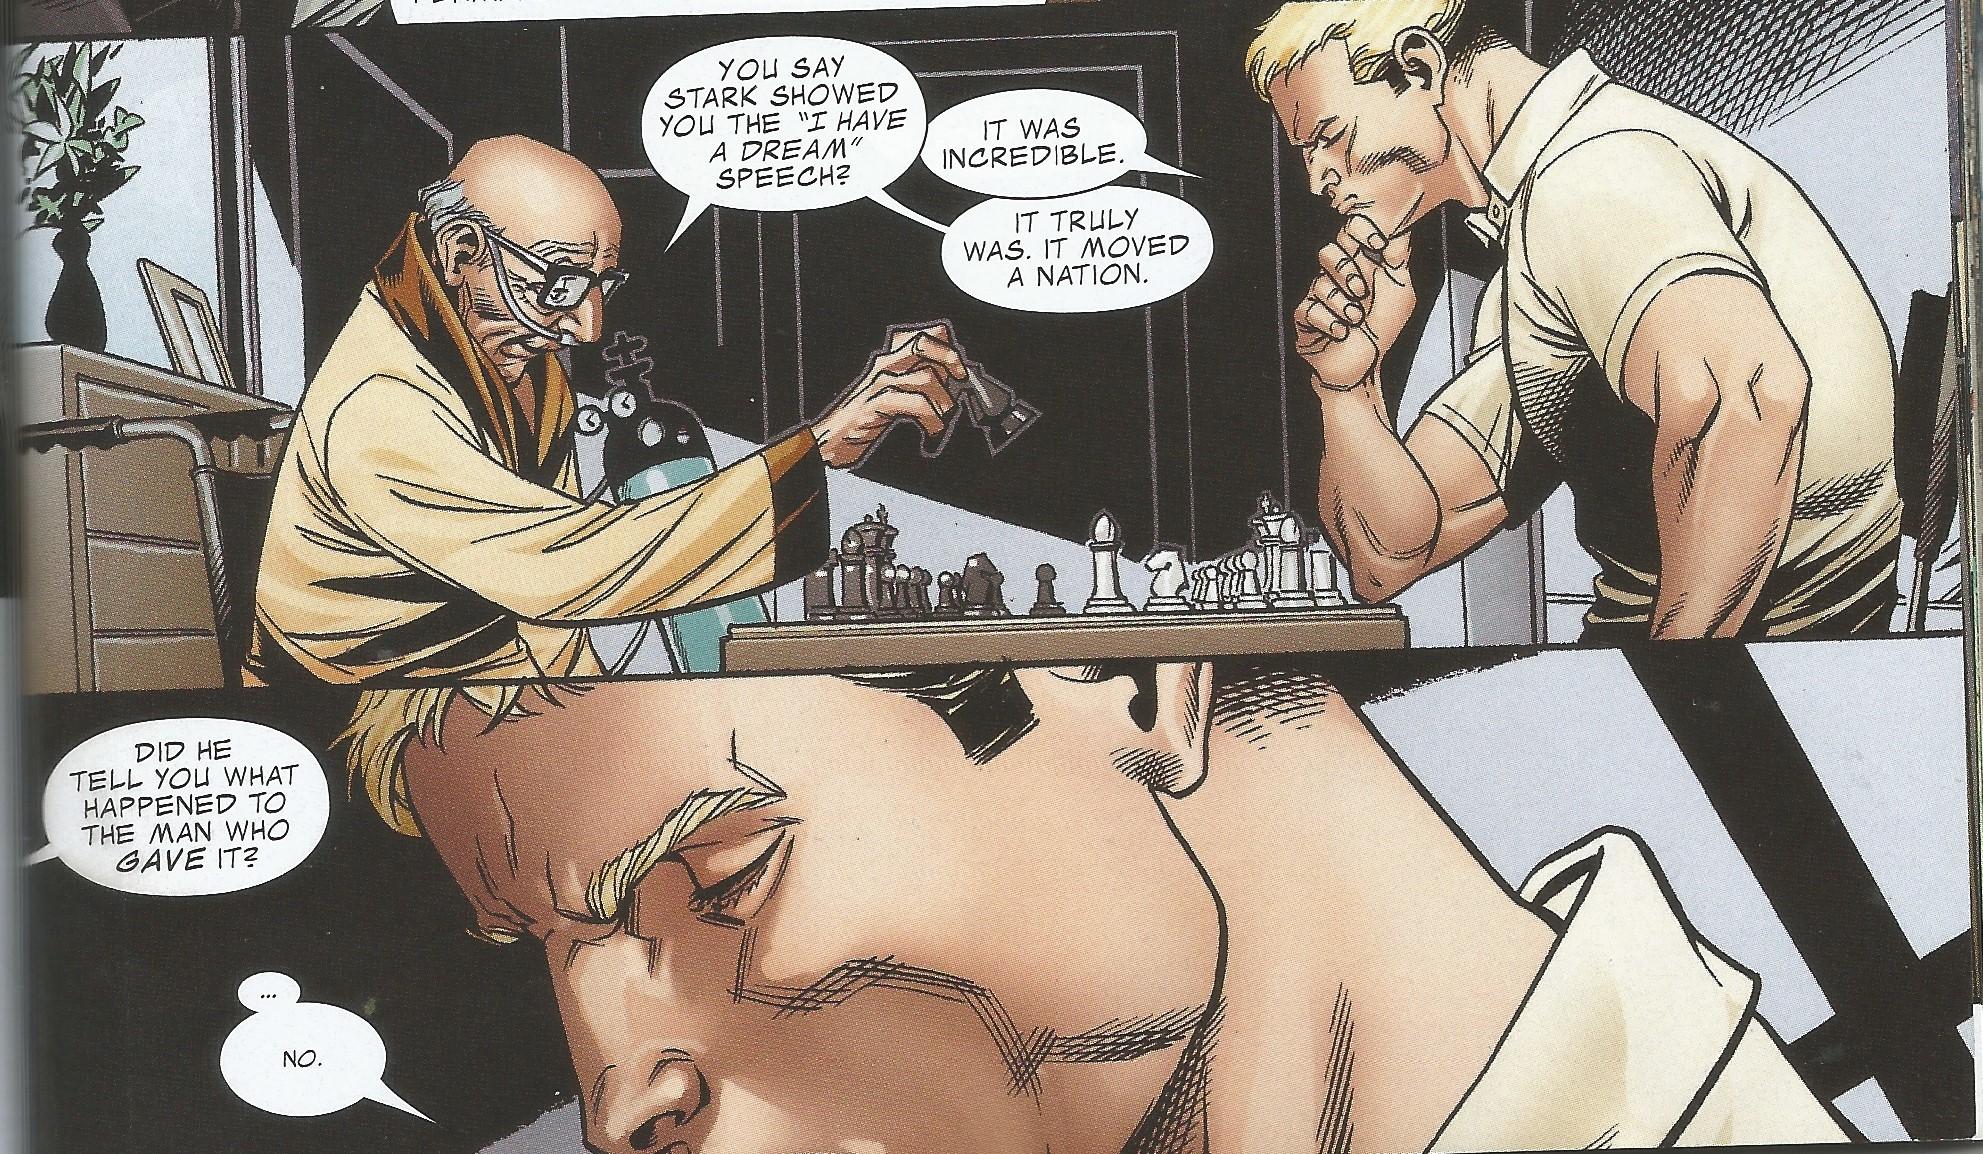 Captain America learns of MLK